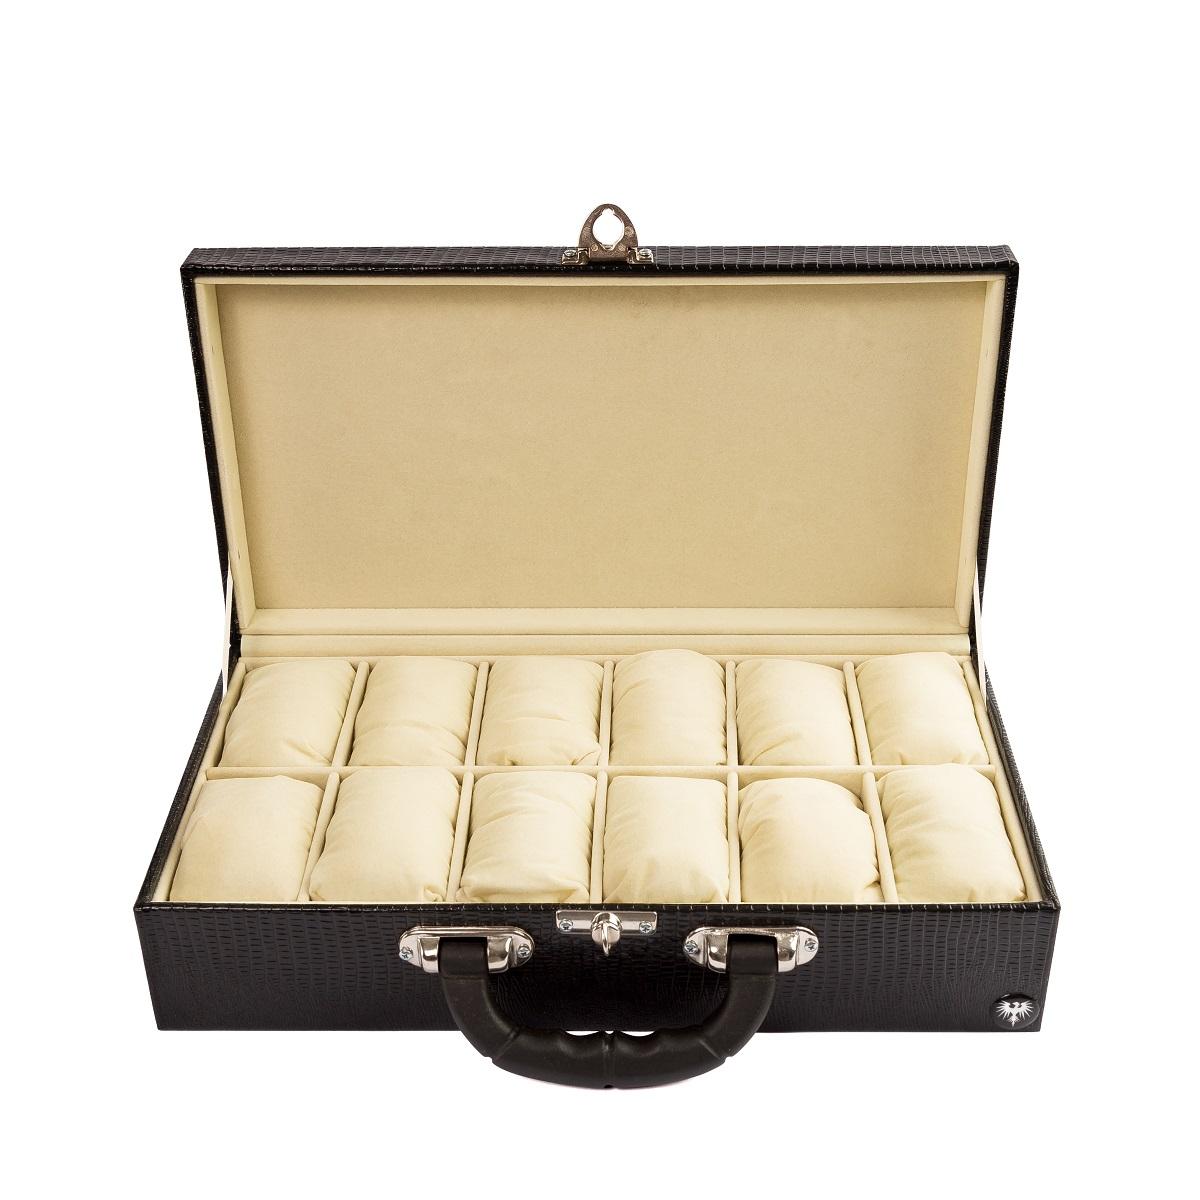 maleta-porta-relogio-12-nichos-couro-ecologico-preto-bege-imagem-4.jpg